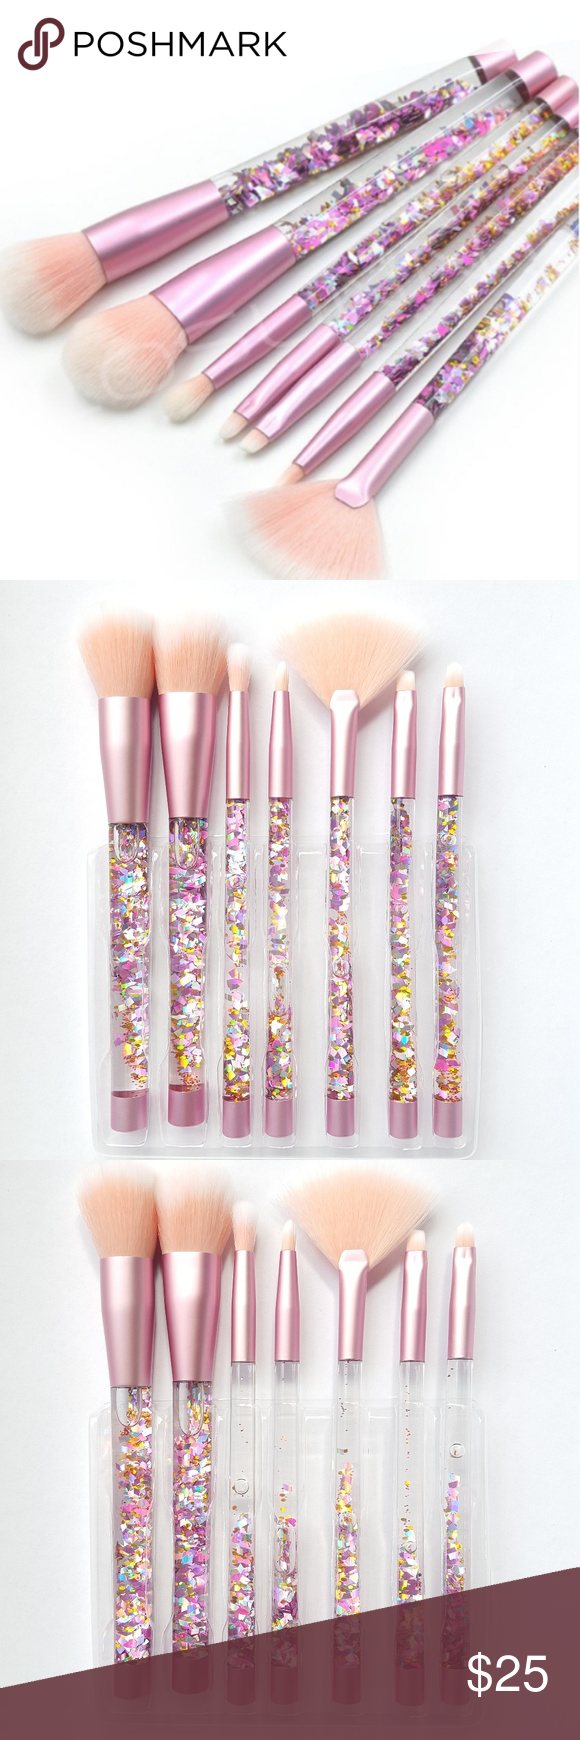 Pink Glitter Tube Makeup Brush (Set of Seven) Makeup